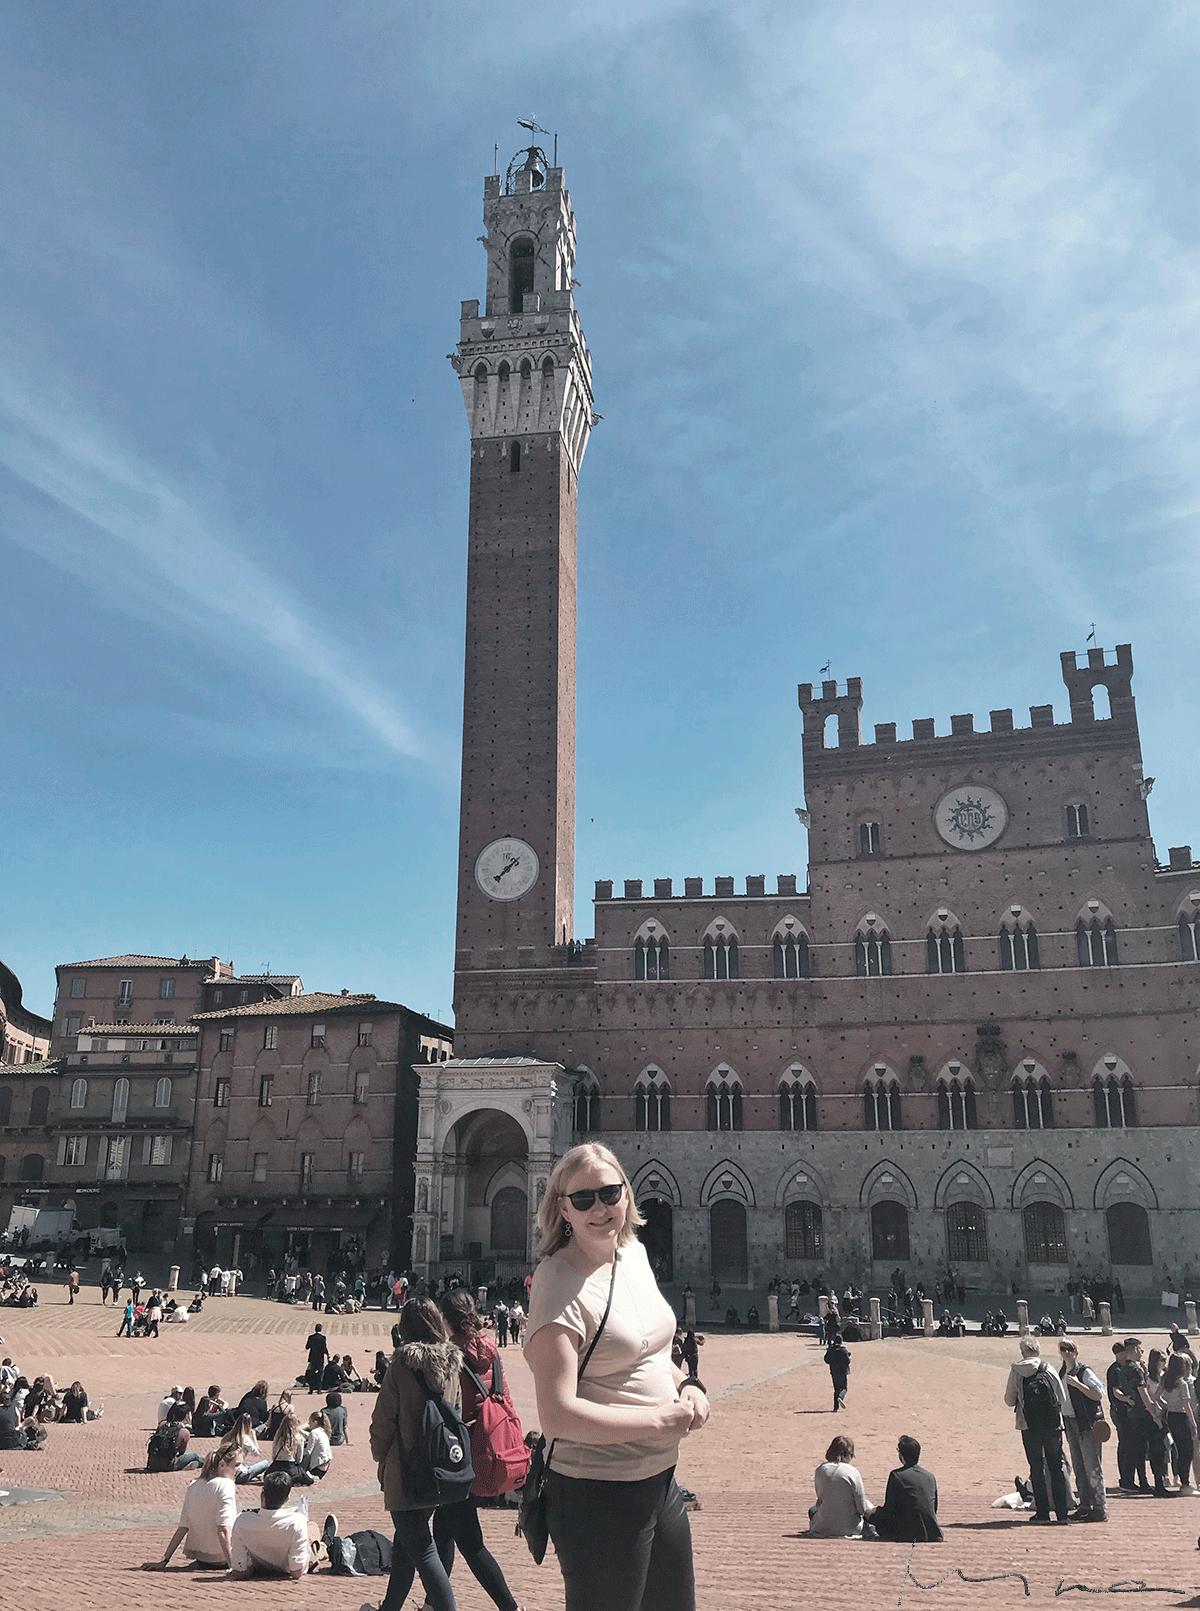 Minna Siena Piazza del Campo